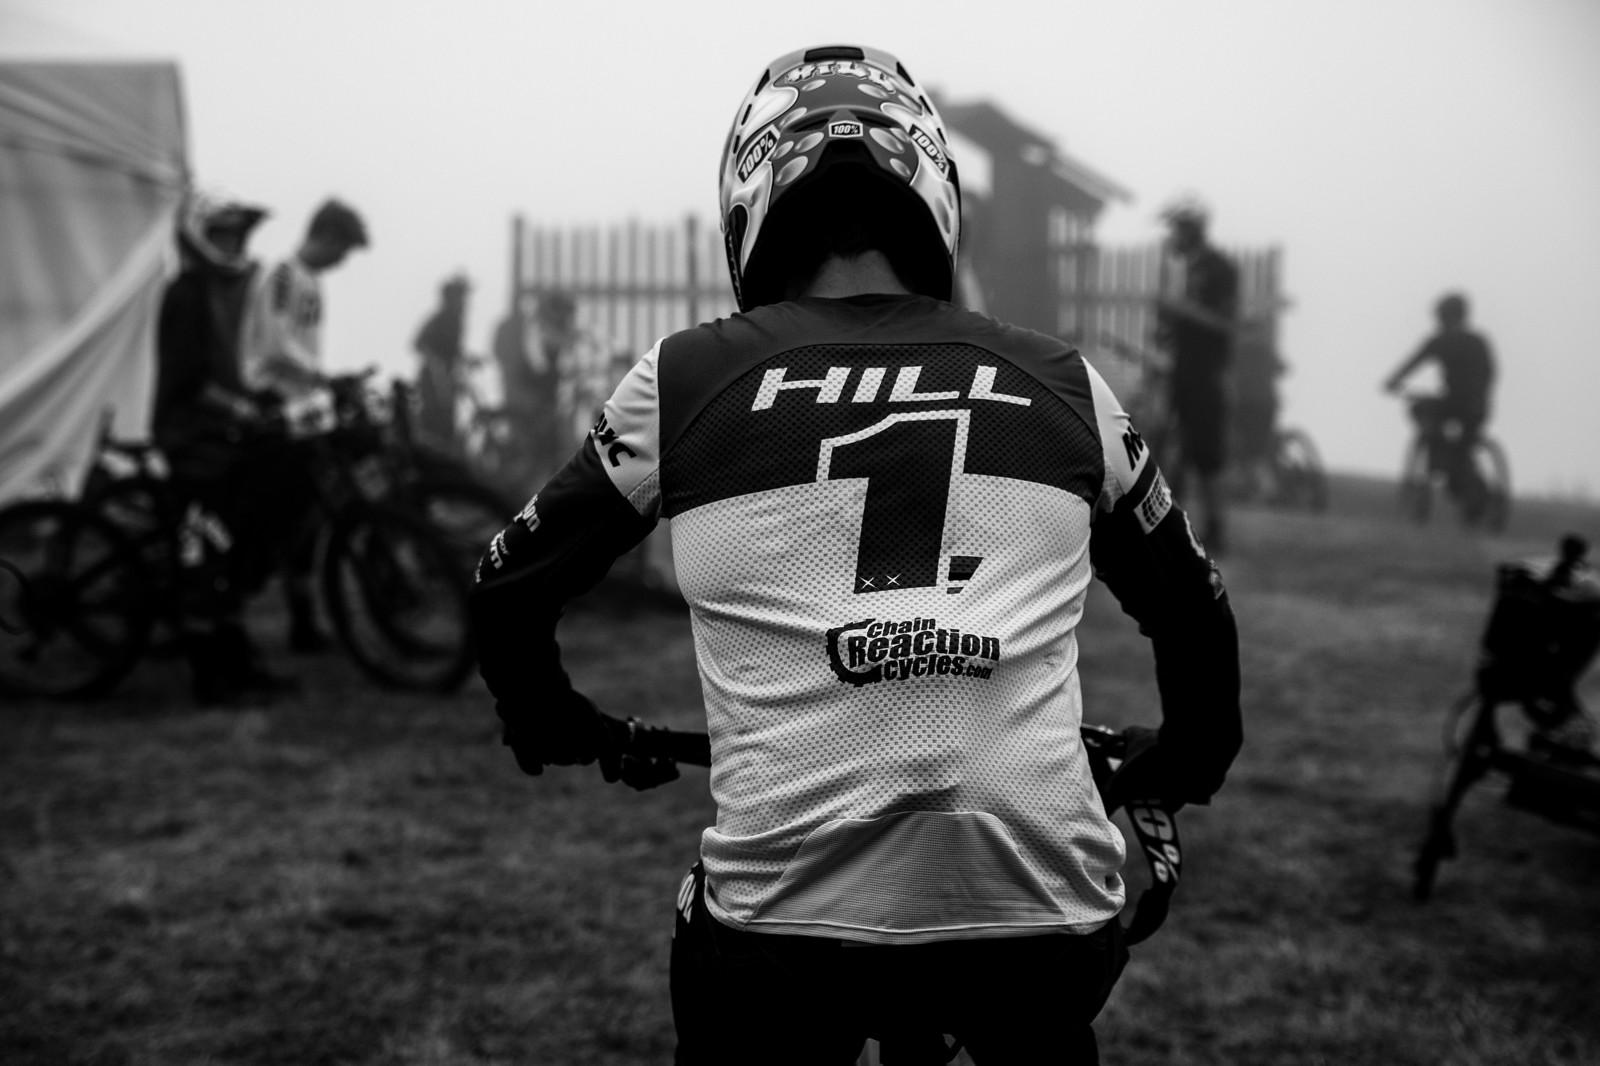 Sam Hill - 2019 Enduro World Series Crankworx Rotorua - Mountain Biking Pictures - Vital MTB